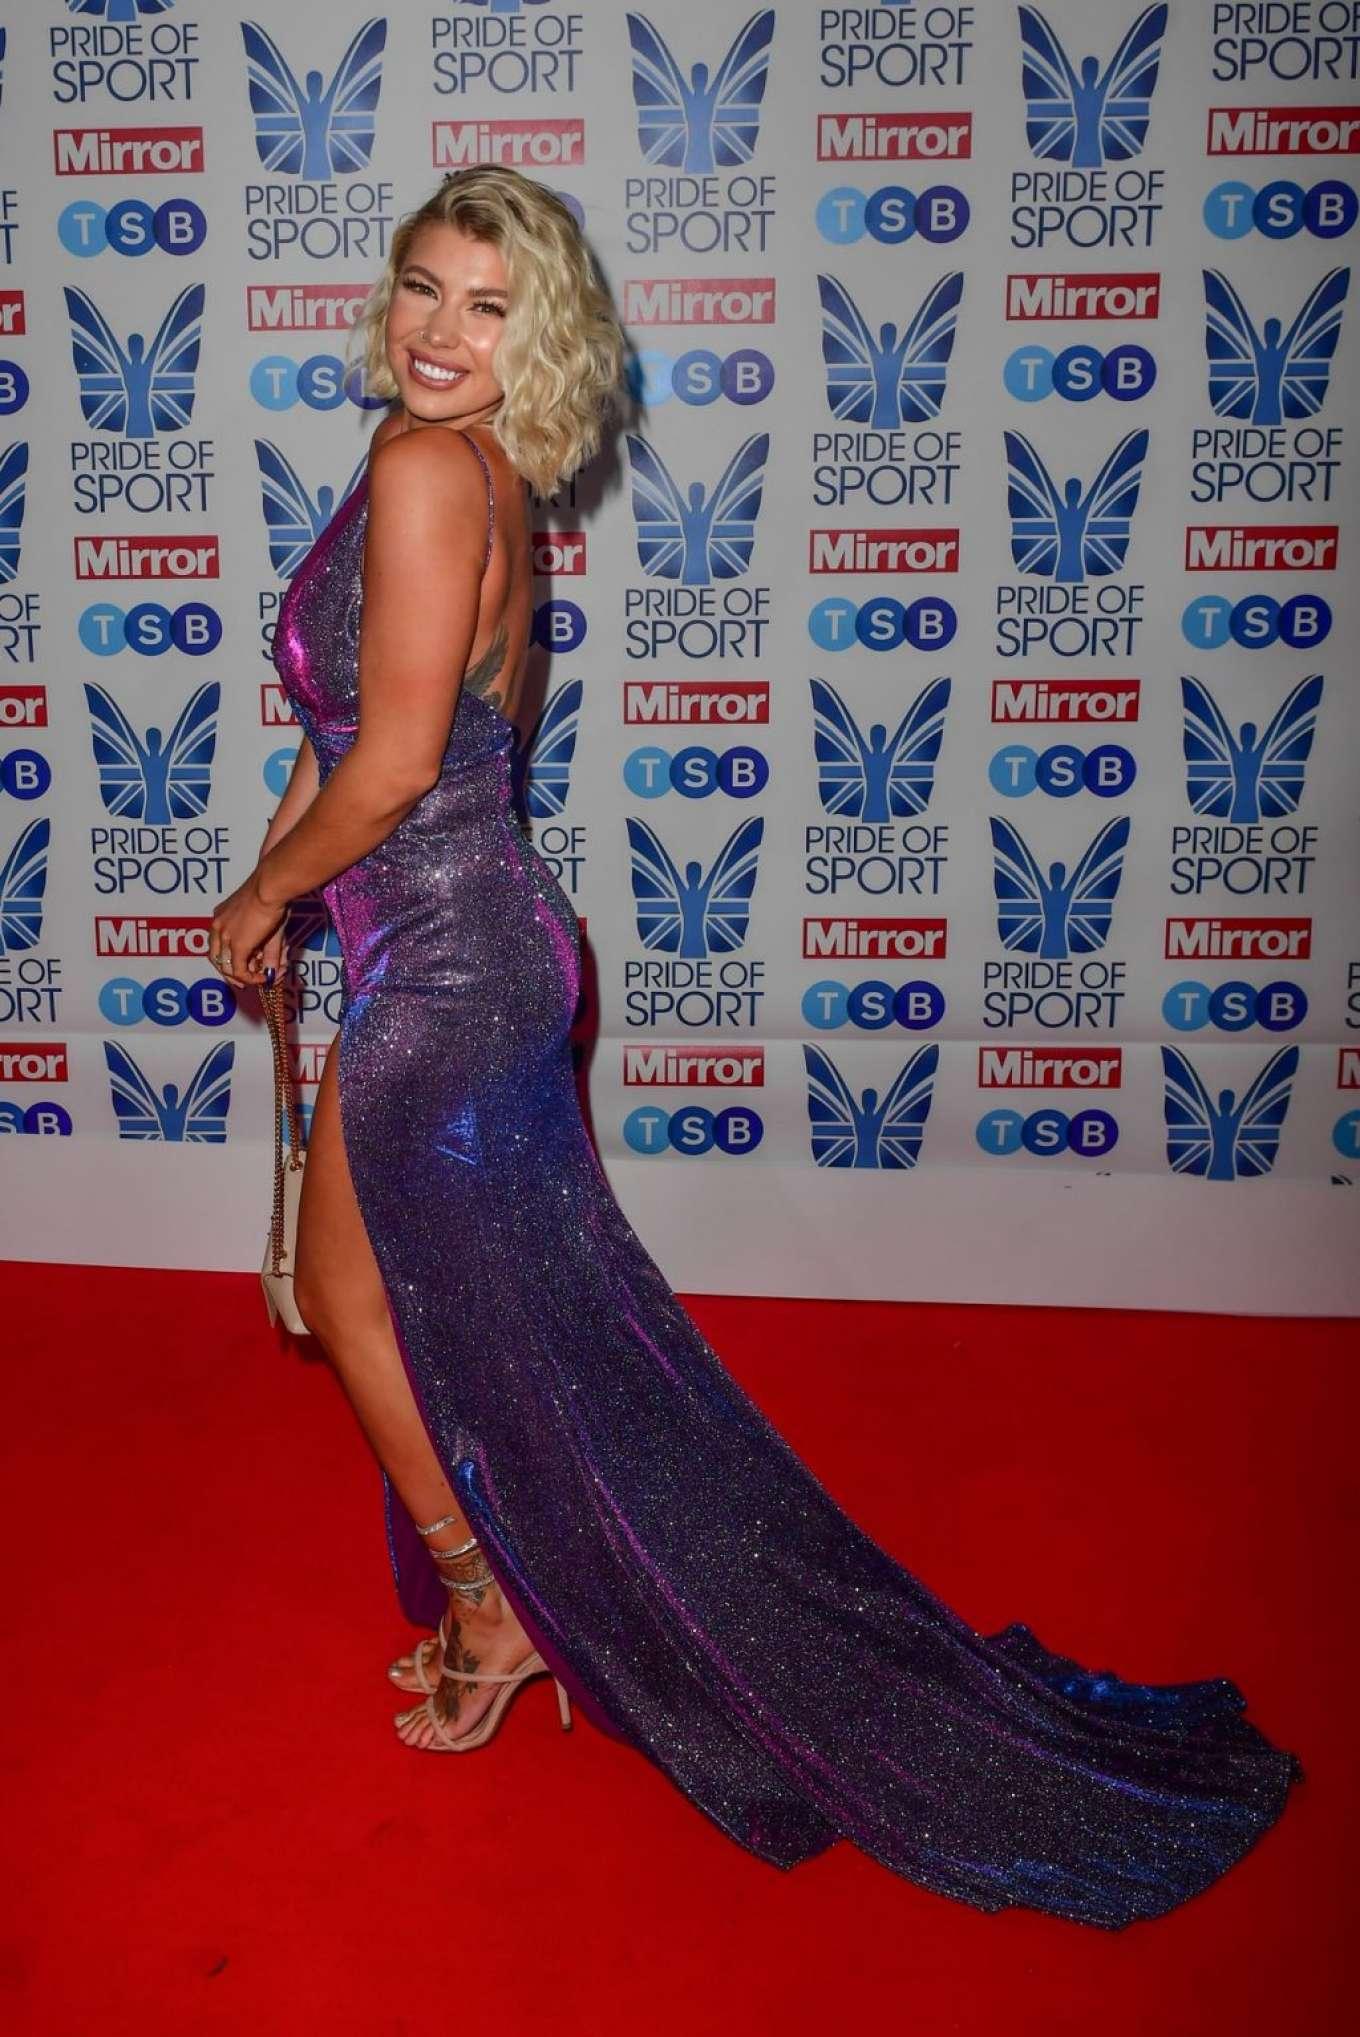 Olivia Buckland 2019 : Olivia Buckland – 2019 Daily Mirror Pride of Sport Awards-33